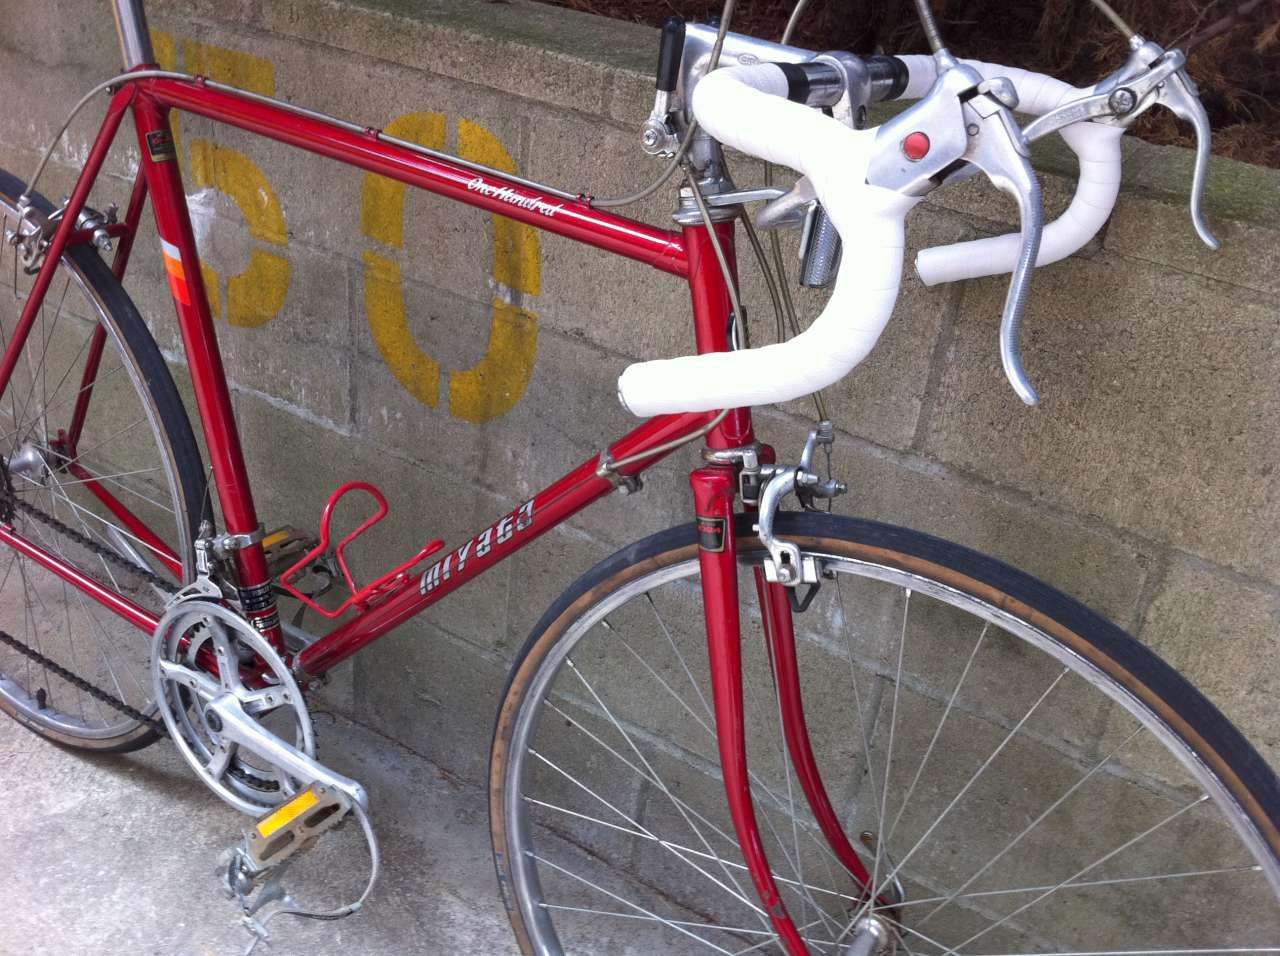 Bike Boom Refurbished Bikes 1984 Miyata 100 One Hundred